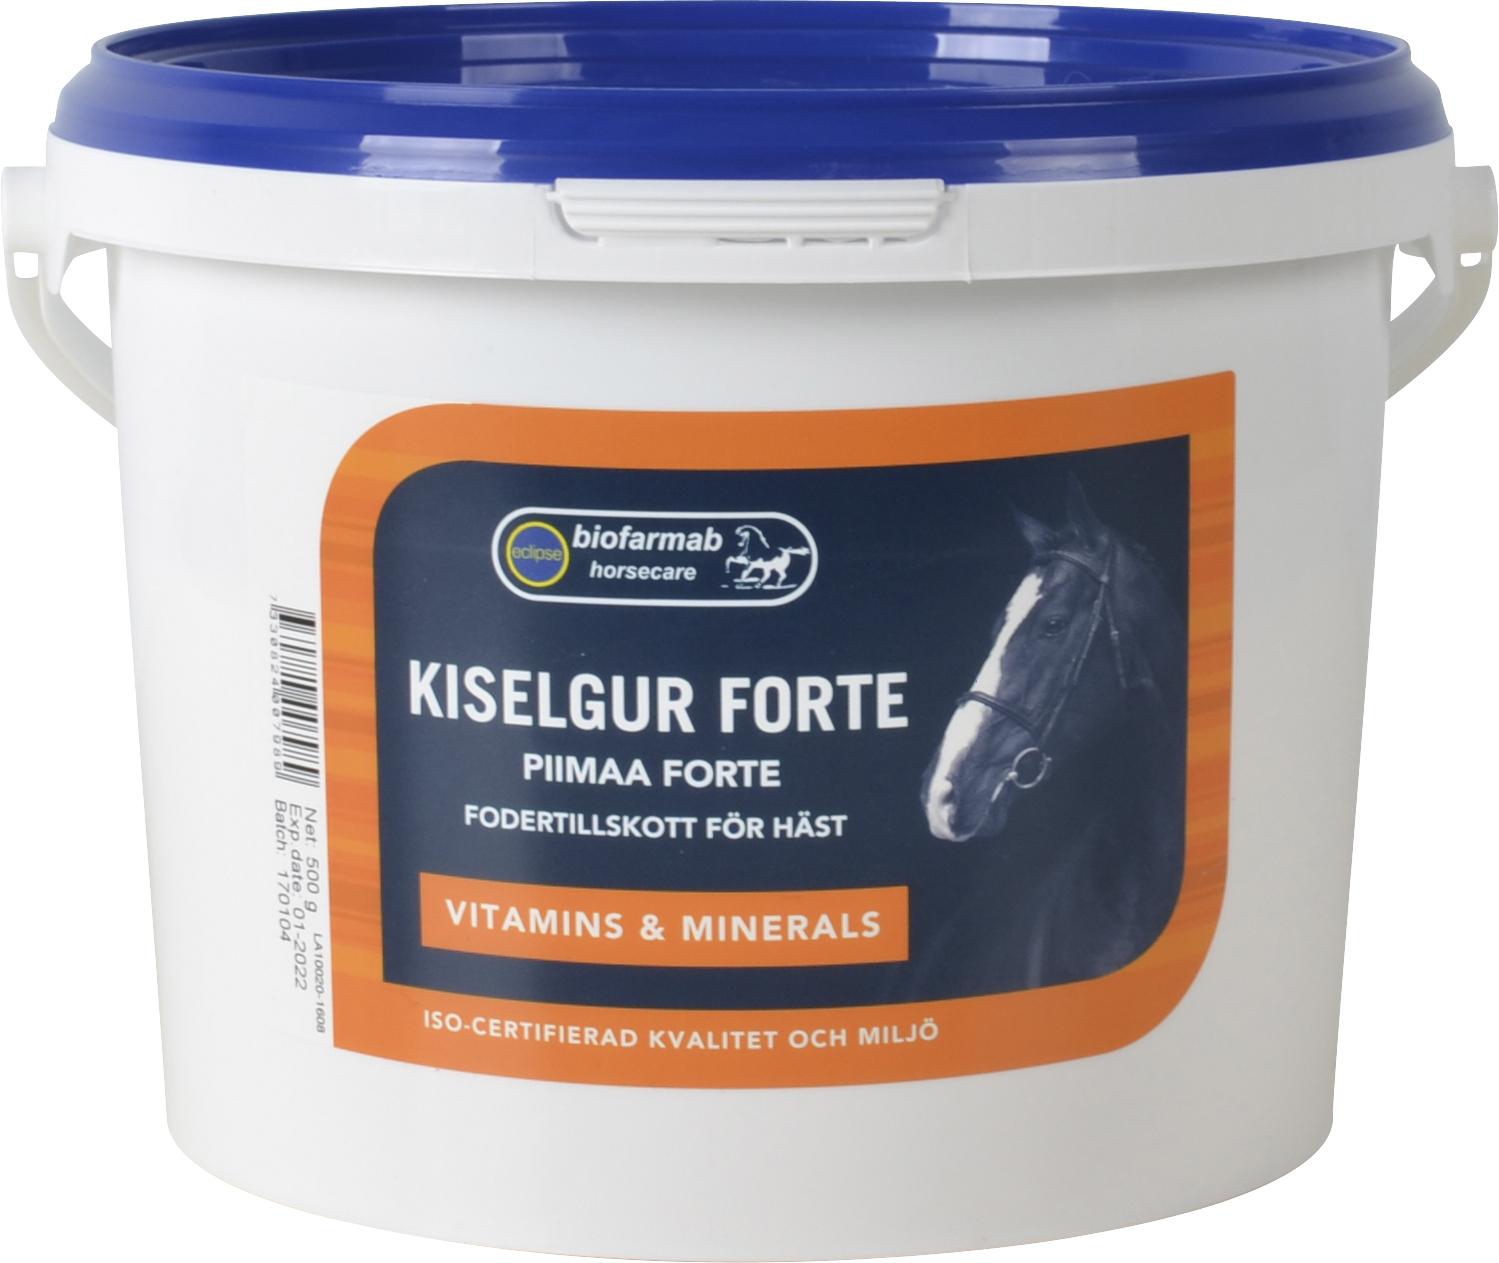 Fodertillskott Eclipse Biofarmab Kiselgur Forte, 500 g